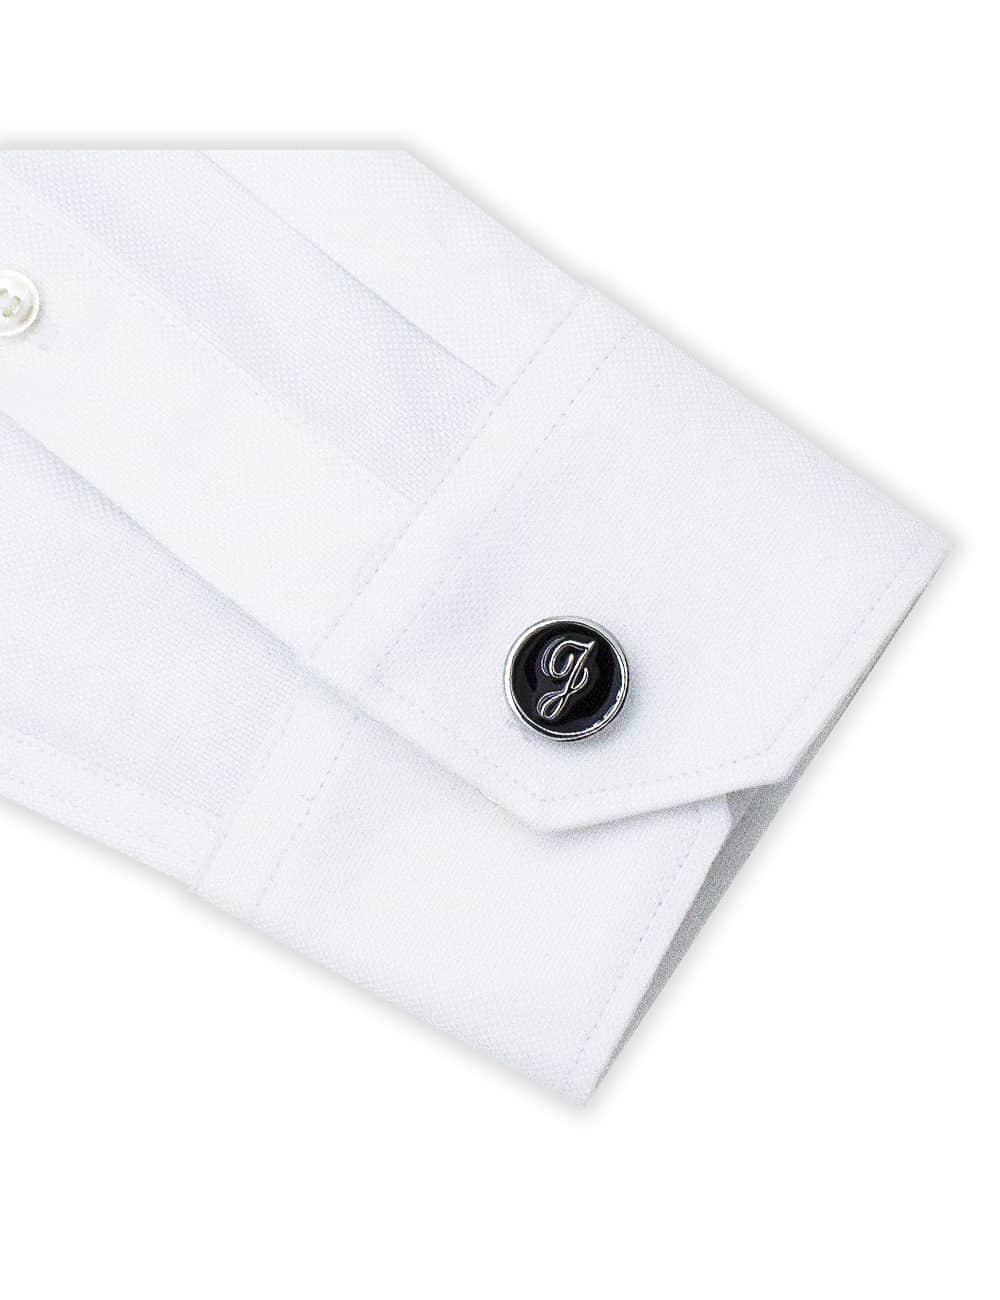 Black Enamel Letter J Cufflink C221NL-020J